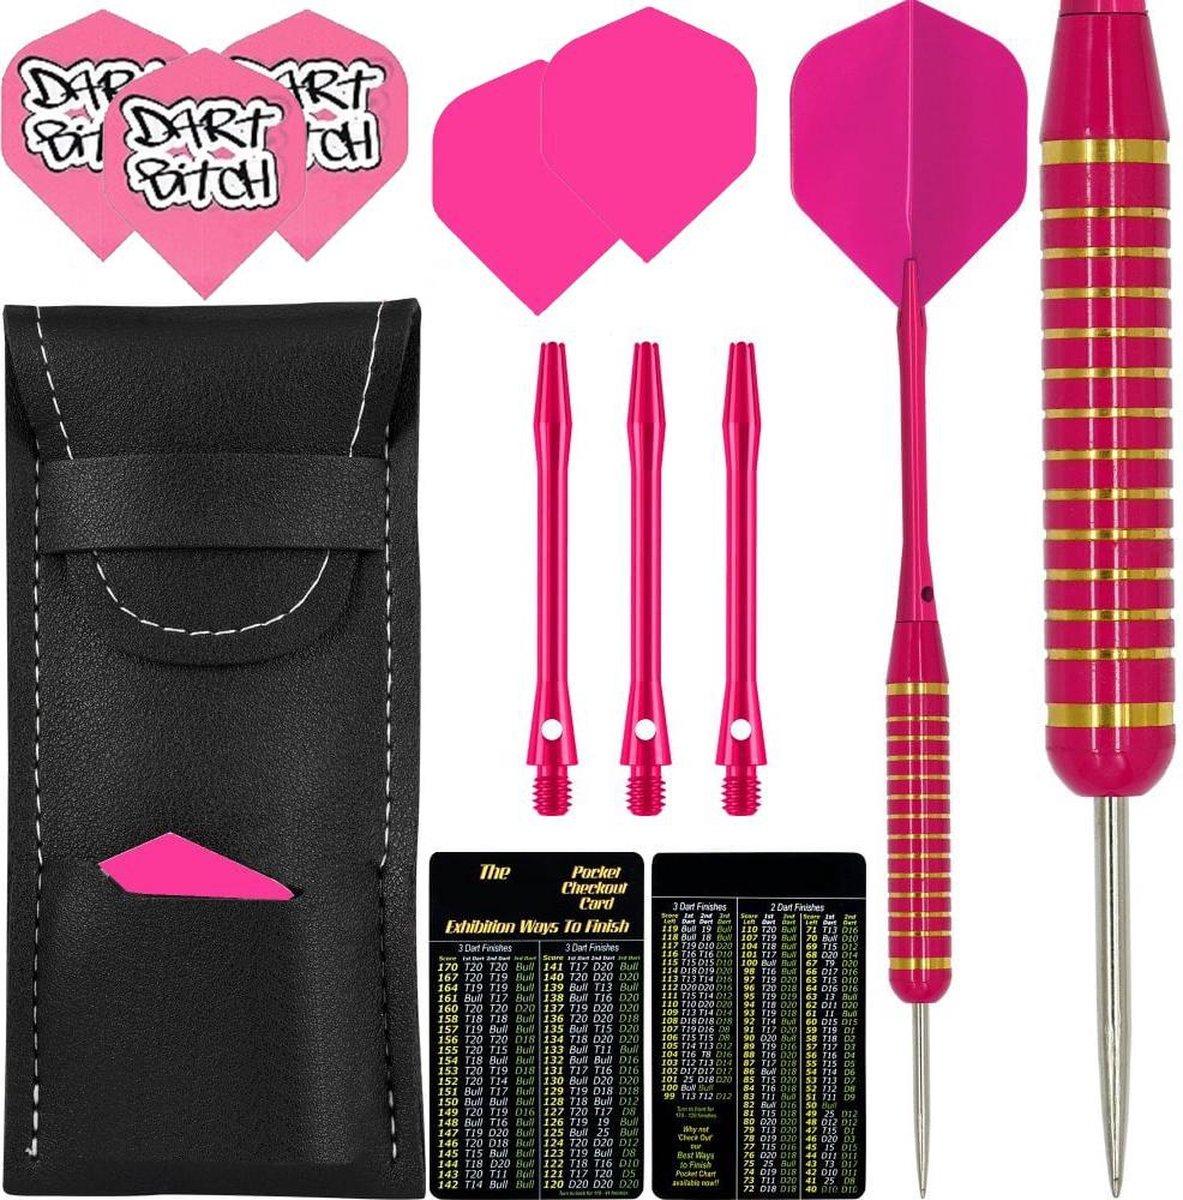 Dragon Darts Pink Lady - dartpijlen - dart shafts - dart flights - dartpijlen 21 gram - dartpijlen roze